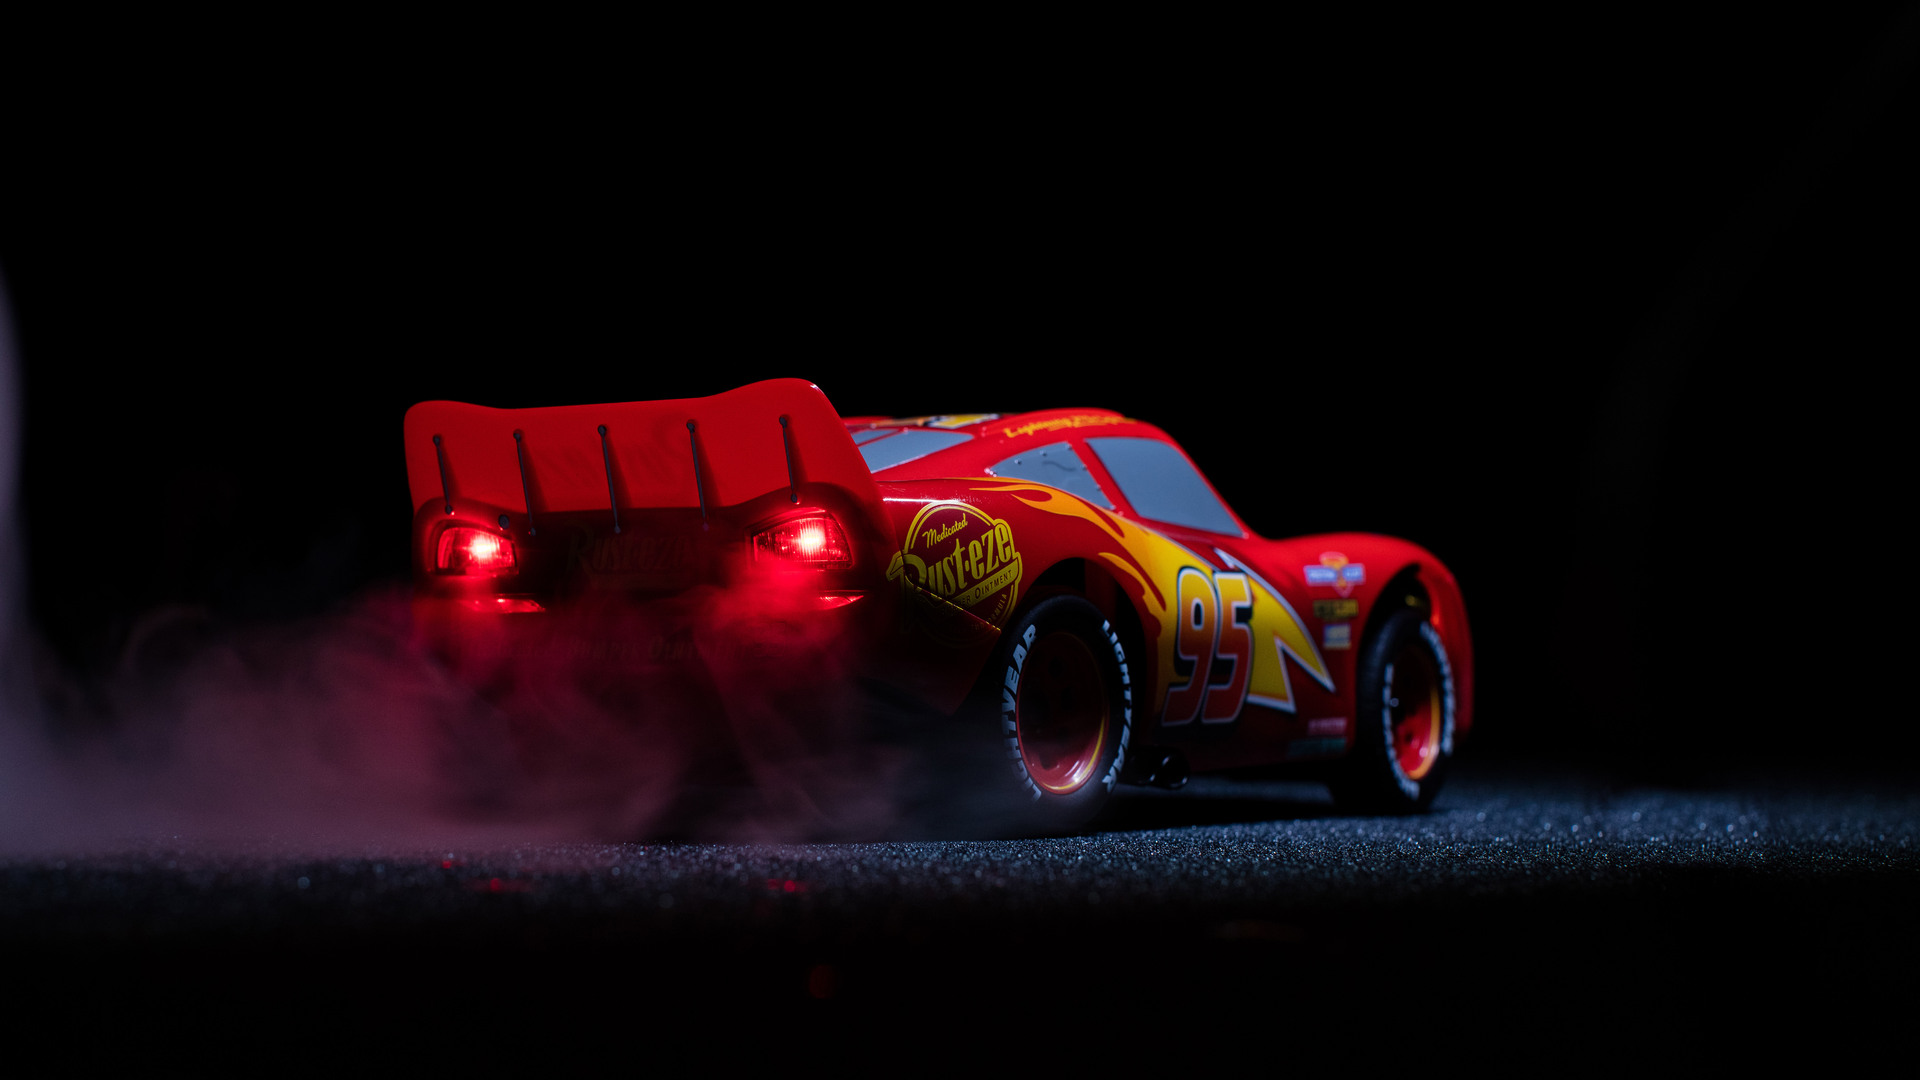 1920x1080 lightning mcqueen cars 3 pixar disney 4k laptop - Disney cars 3 wallpaper ...